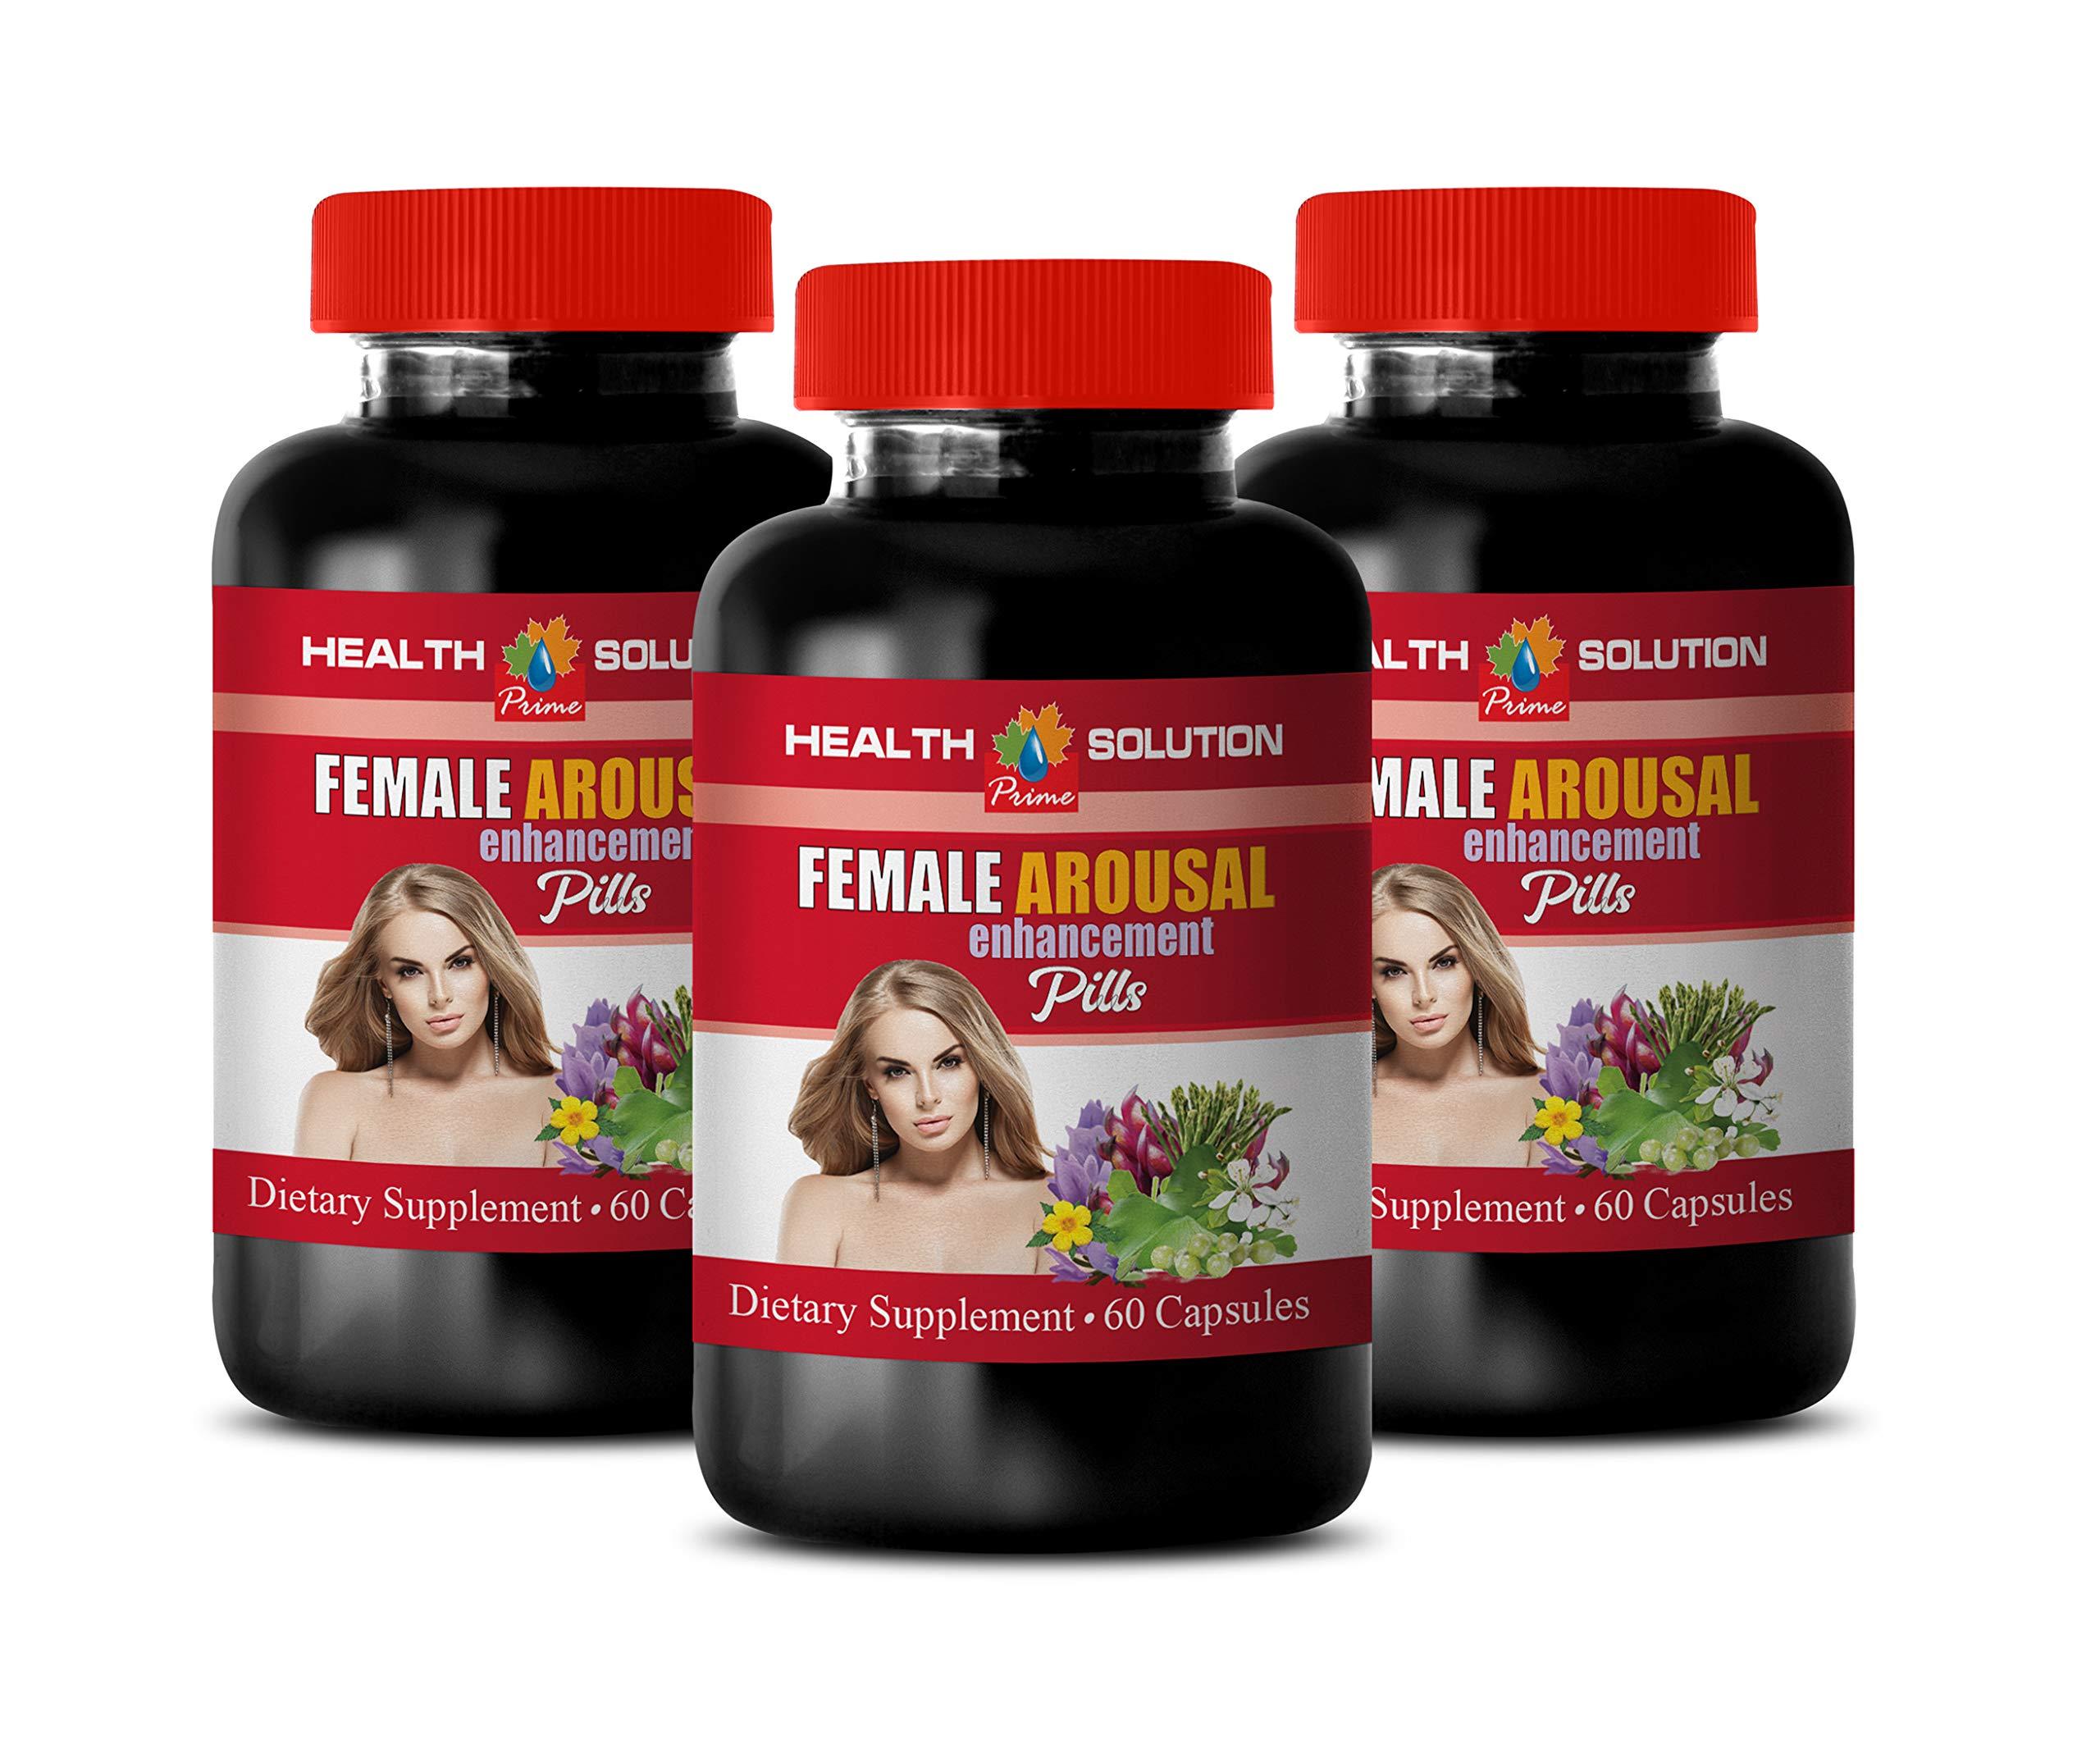 Female libido Supplement Boost - Female Arousal Enhancement Pills - Dietary Supplement - Ginkgo biloba for Women - 3 Bottles 180 Capsules